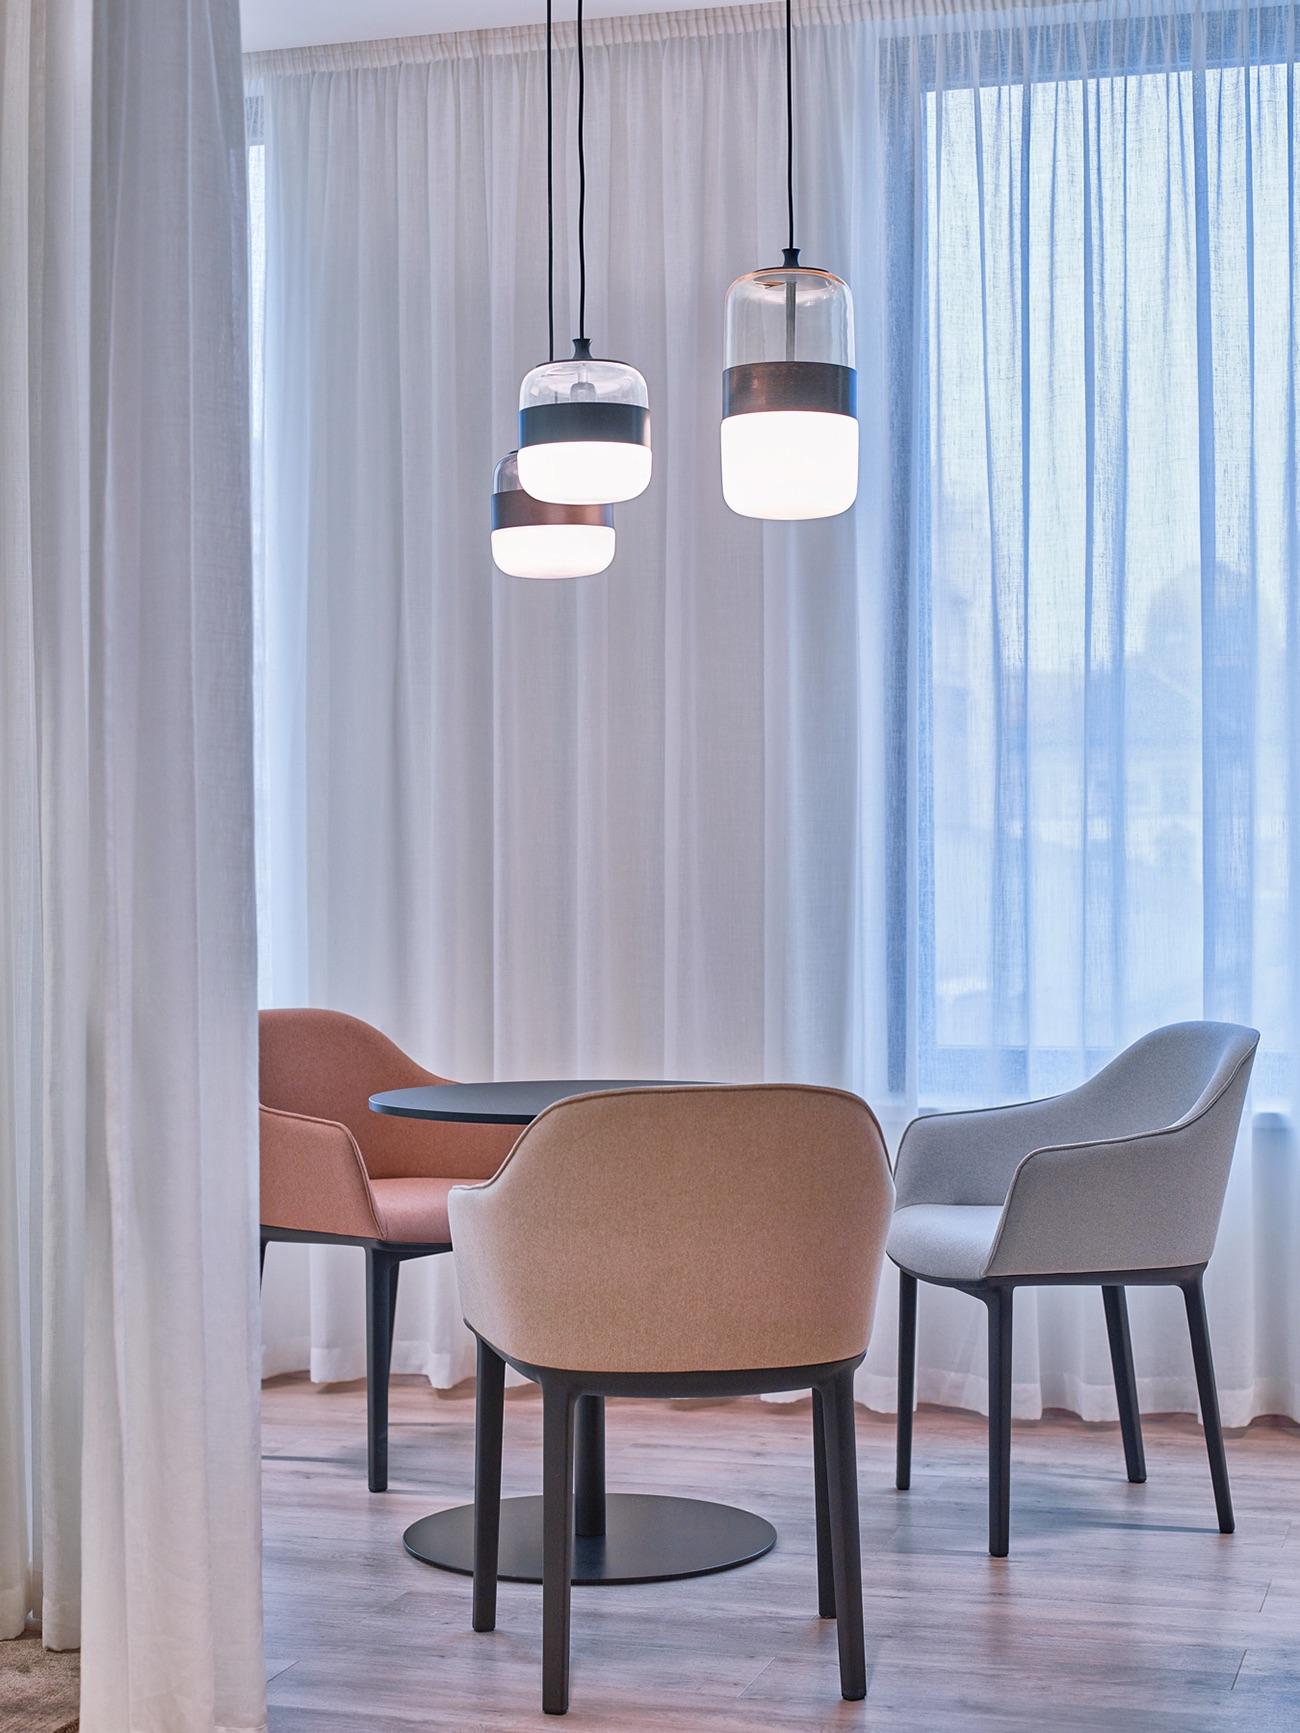 cordia-budapest-office-6